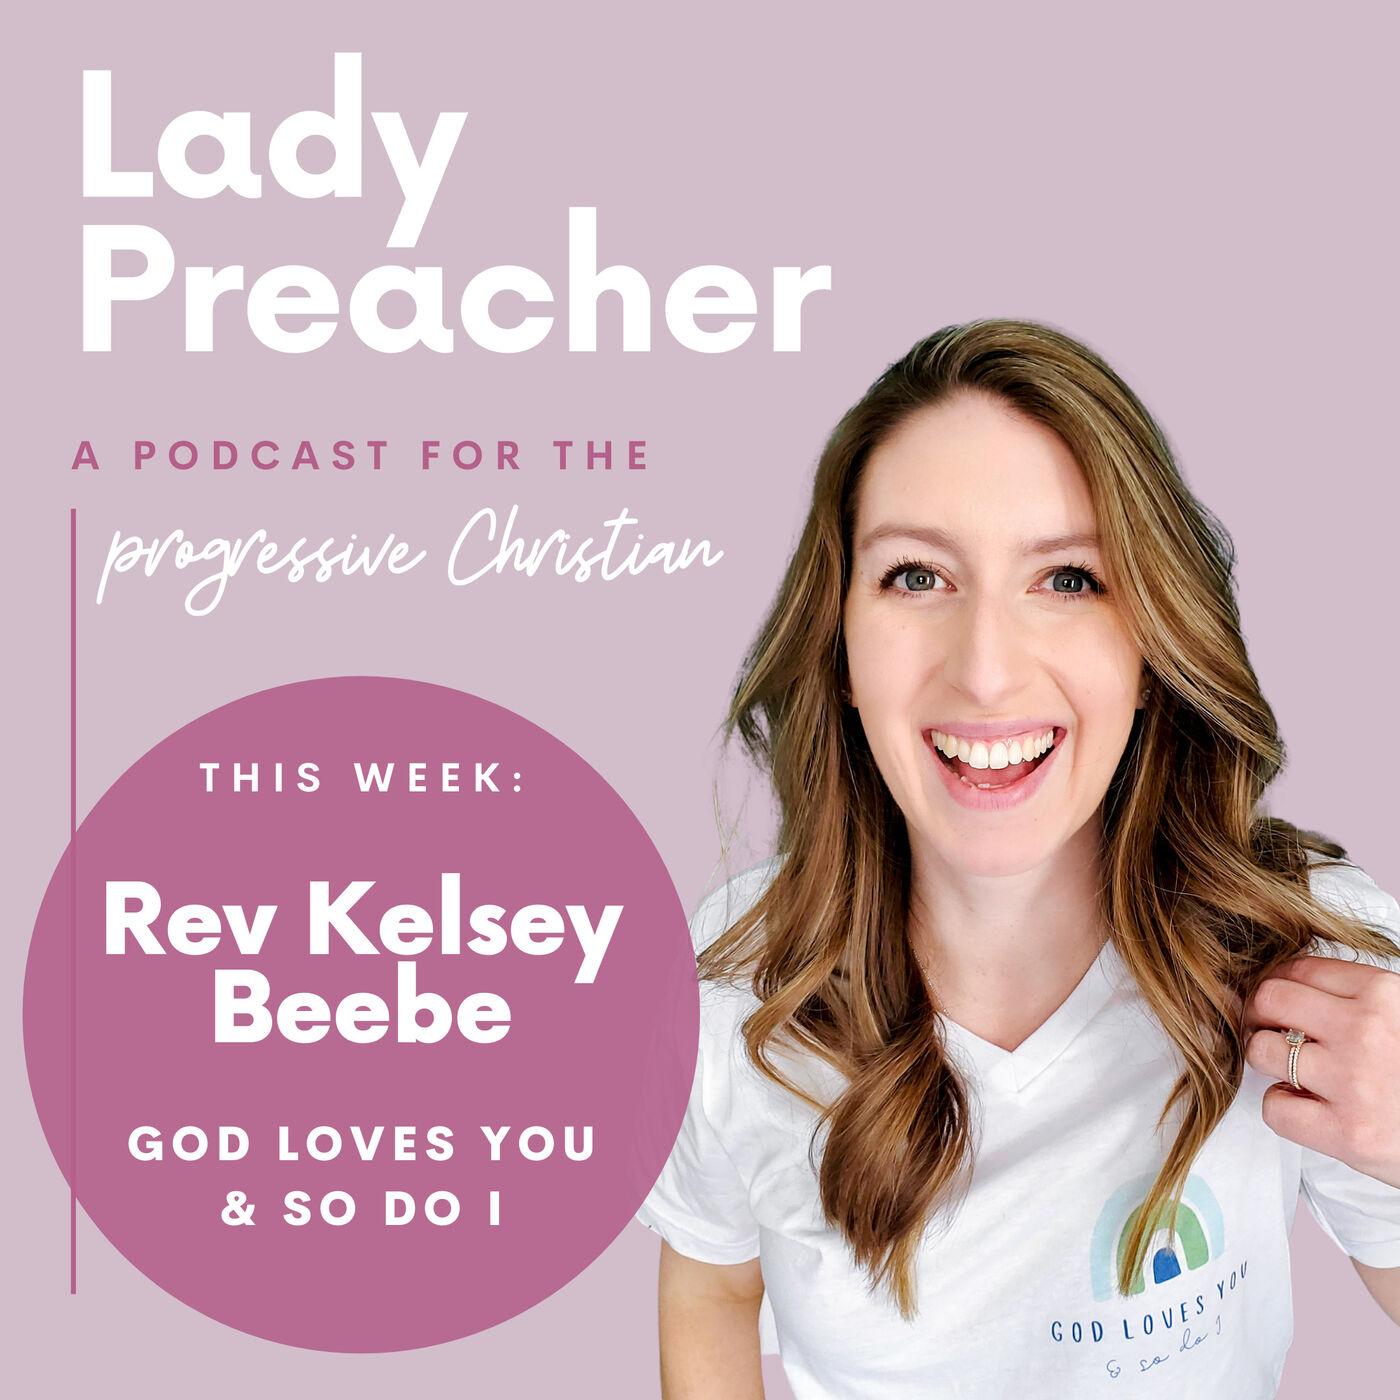 Special Birthday Episode: God Loves You & So Do I